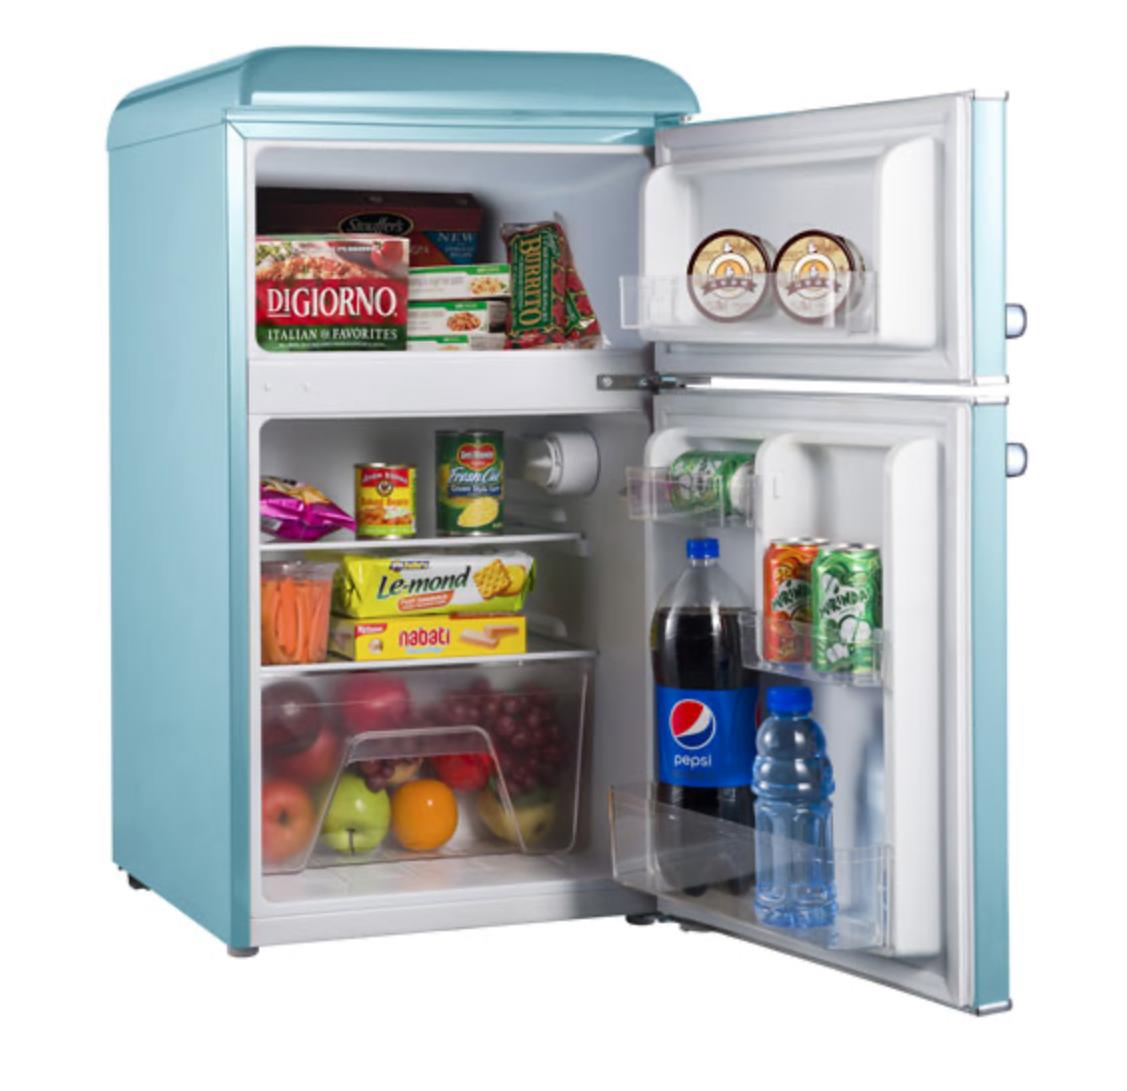 Retro bar fridge